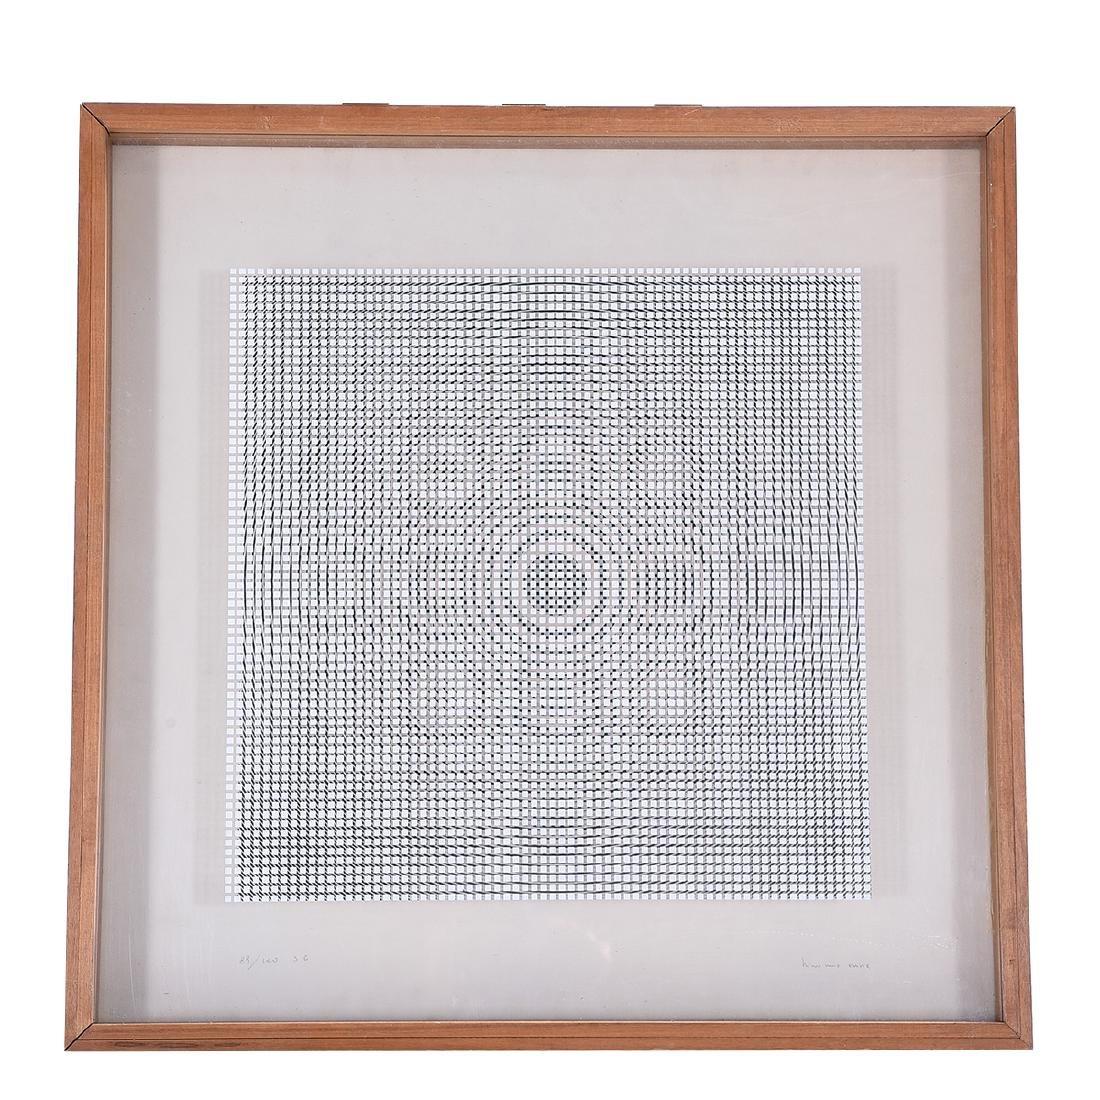 Attrib. to Alberto Biasi, Untitled double silkscreen - 5